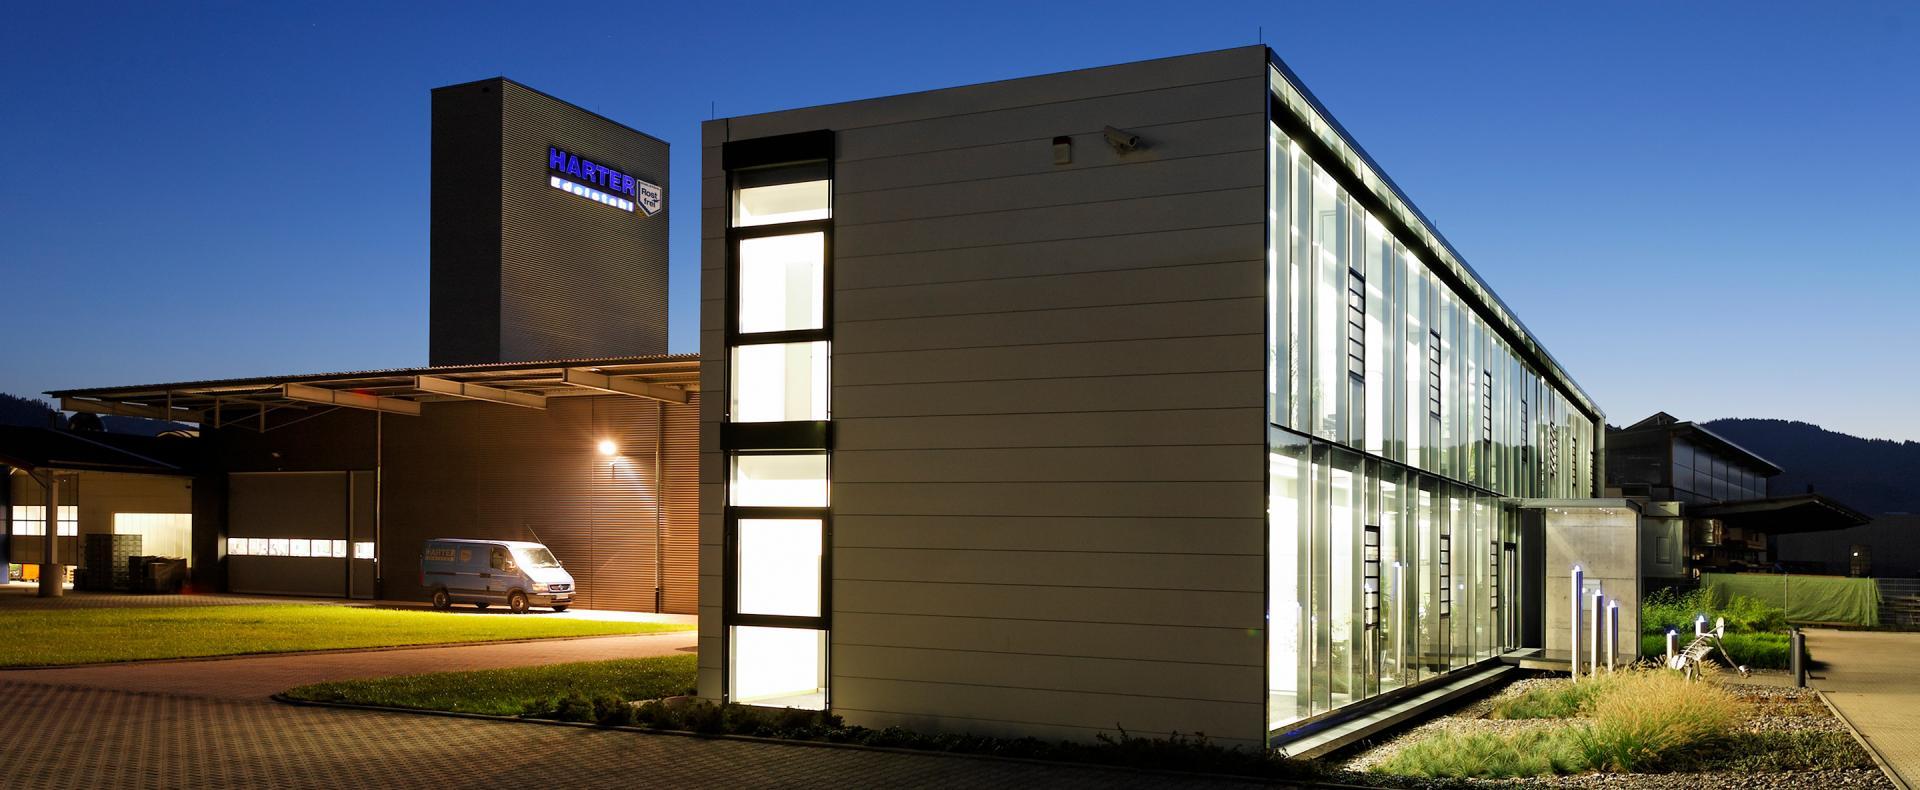 harter schmelzle partner mbb architekten bda. Black Bedroom Furniture Sets. Home Design Ideas